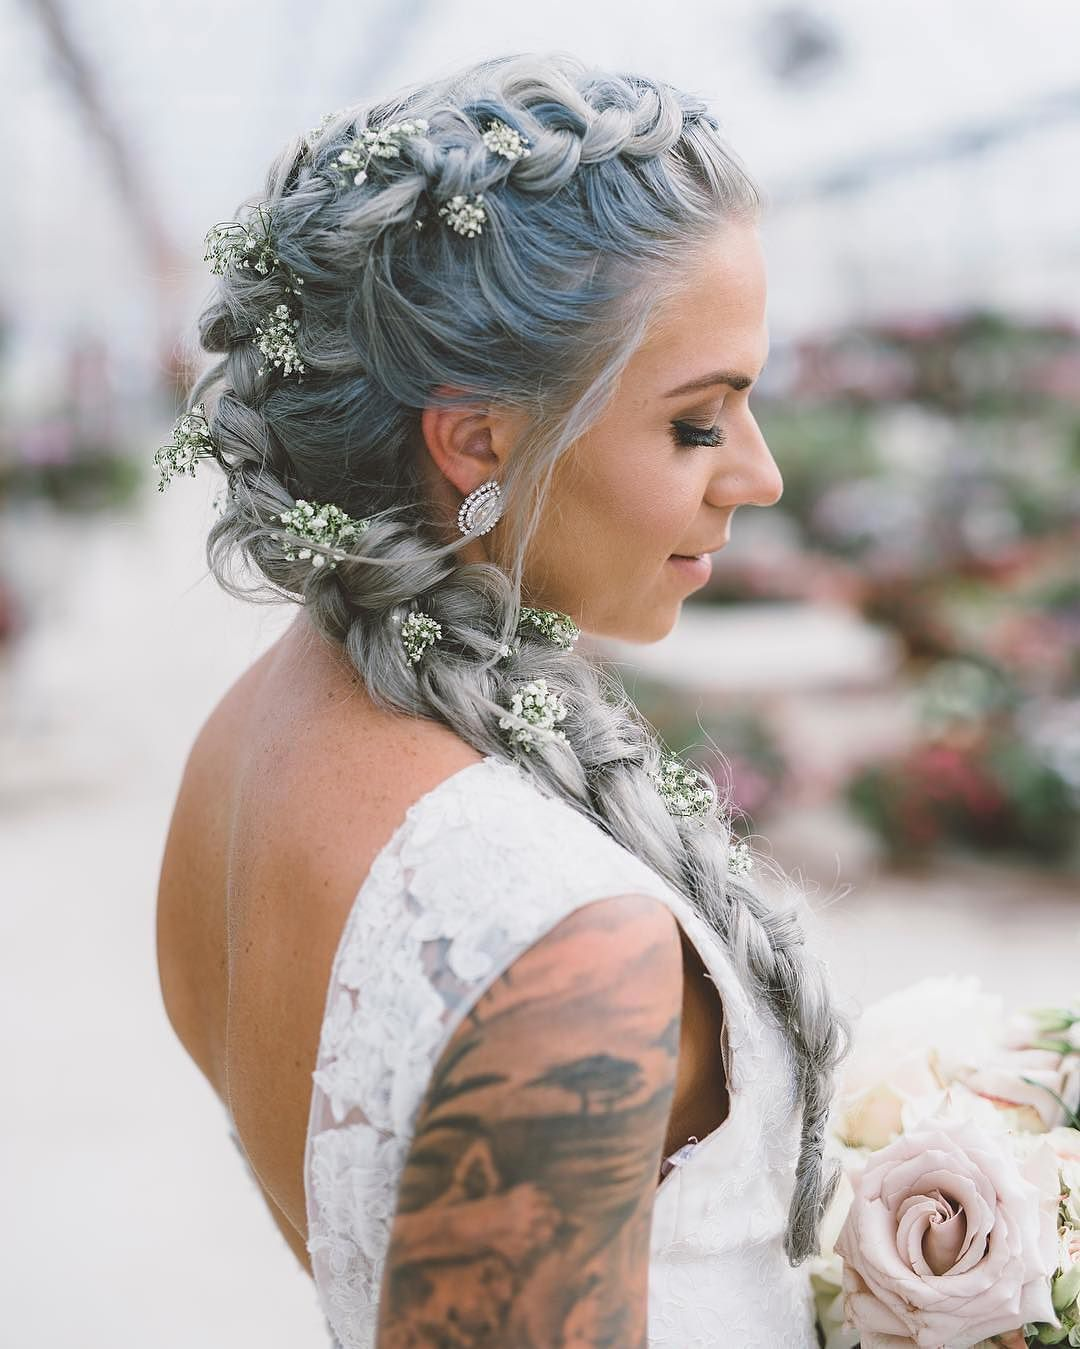 Pin by davidus bridal on shop the look pinterest wedding dress